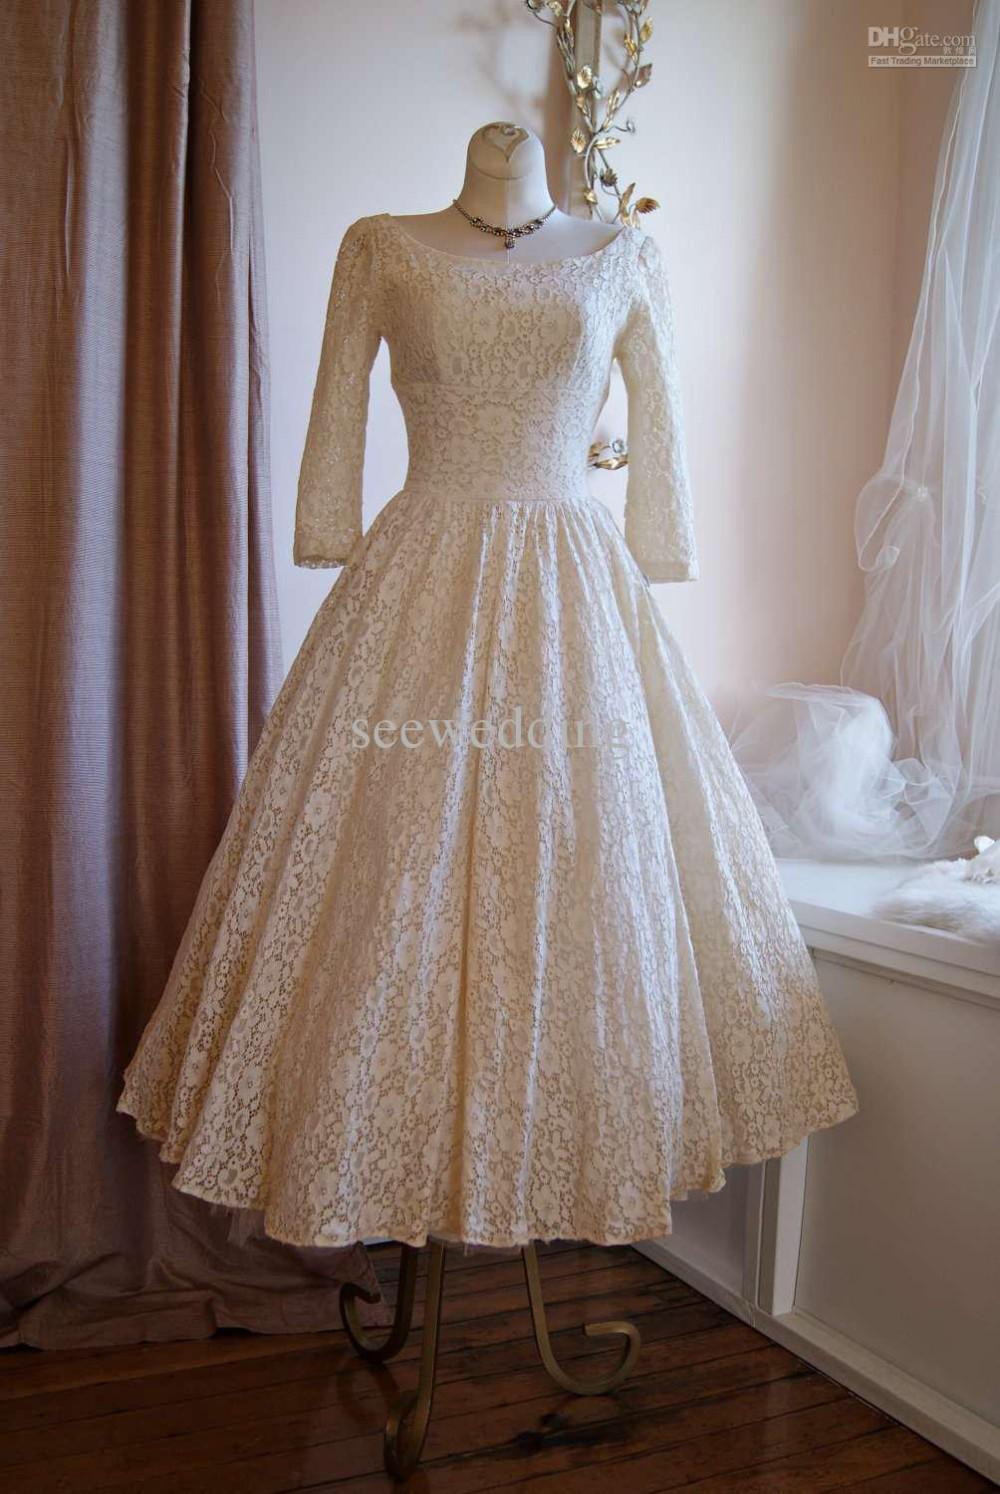 bridal wear 50s wedding dress tb doris s Fifties style wedding dress with sweetheart neckline